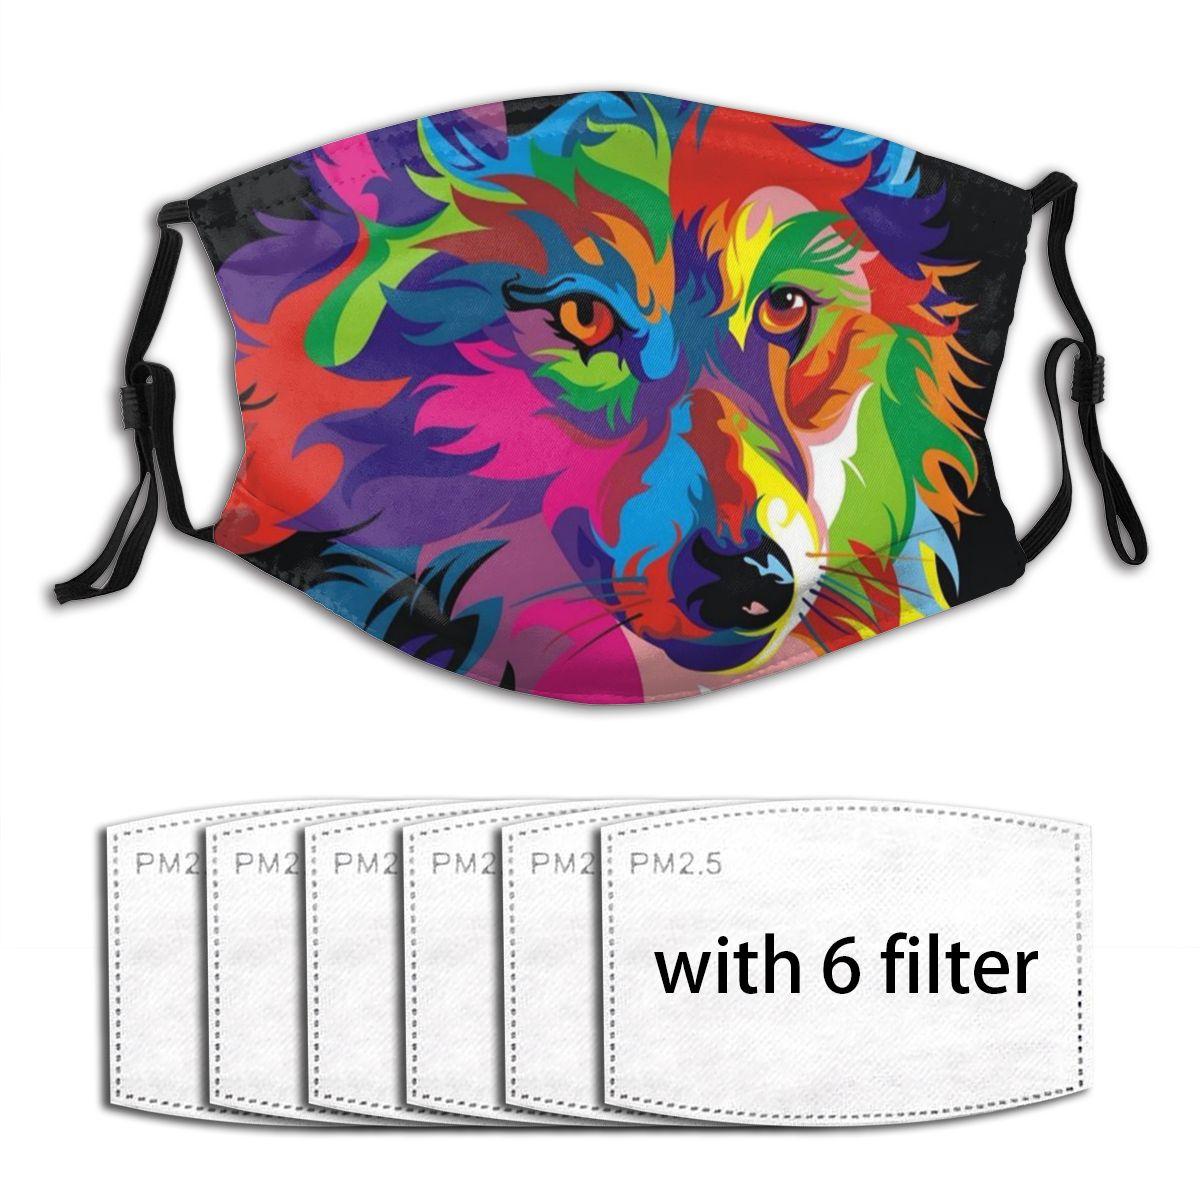 Colorida da Poeira dos Lobos da Pintura com Filtro de Carbono Adulta da Boca-muffle Pm2.5 para a Cara Máscara Ativado Reutilizável